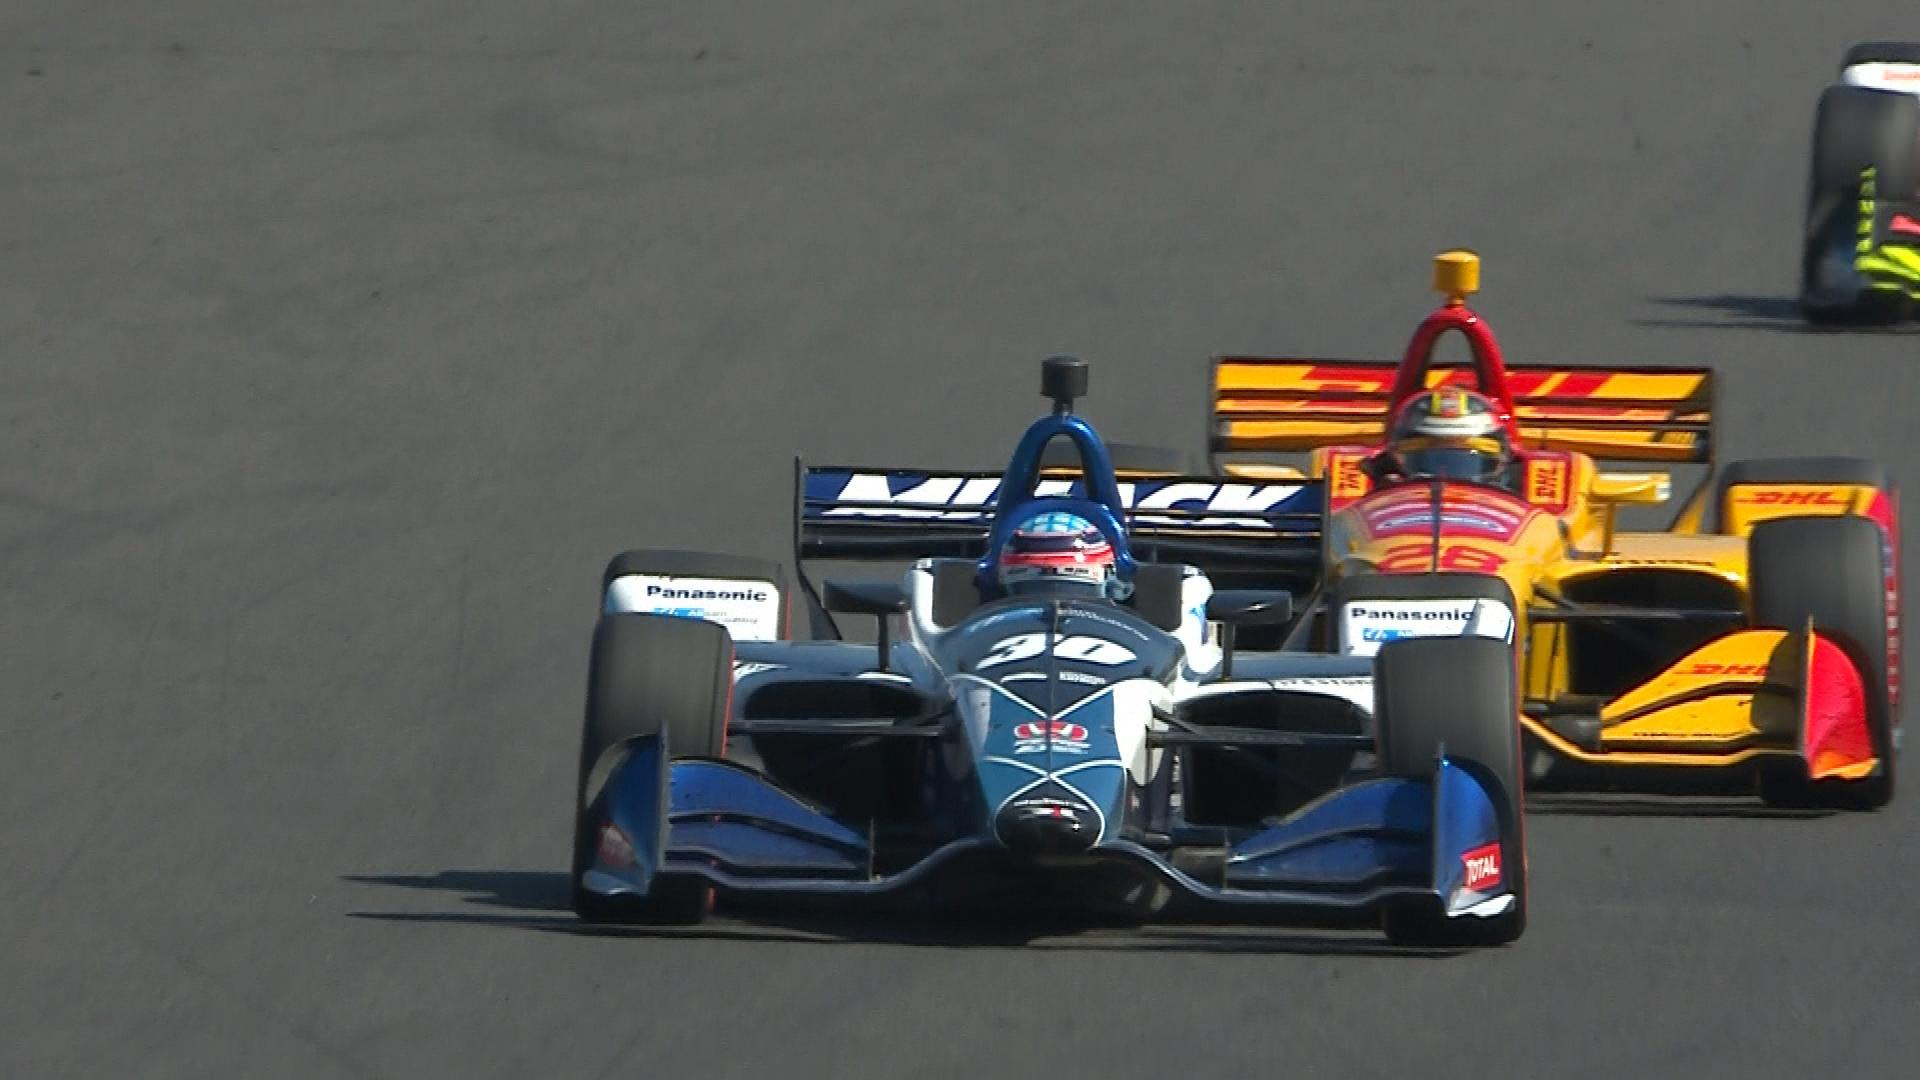 IndyCar's return to Portland starts with crash, ends with Takuma Sato win